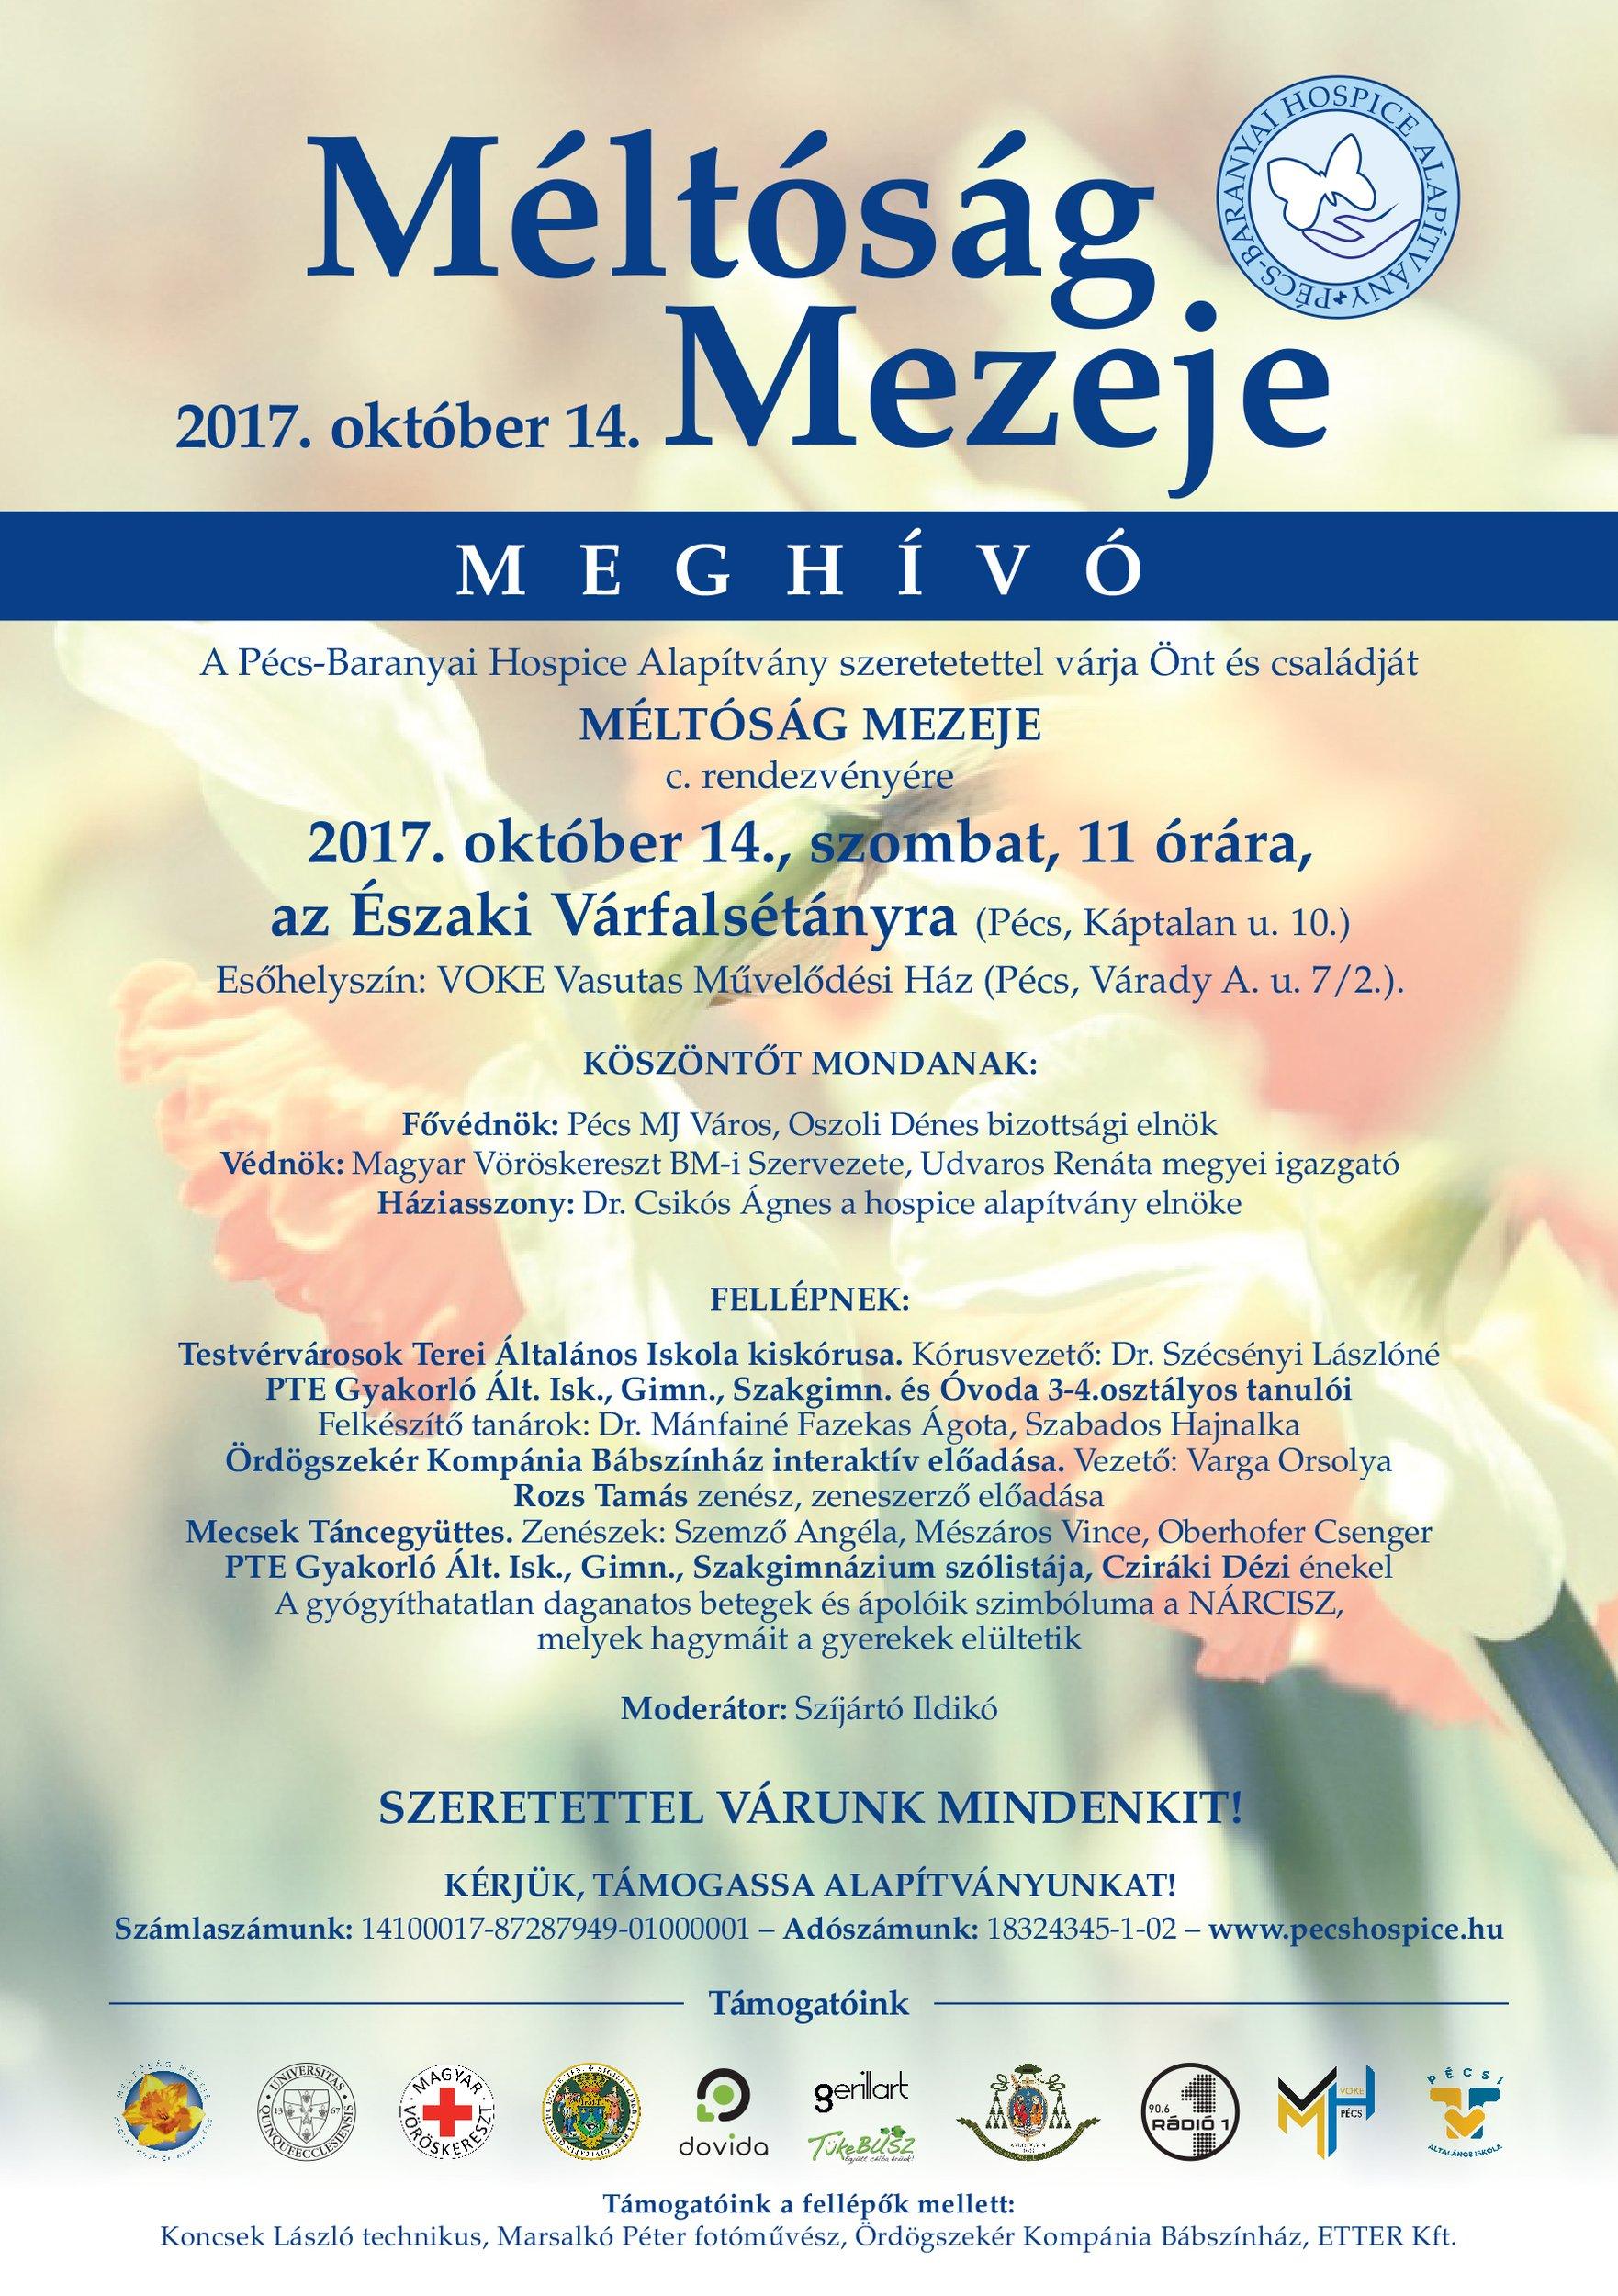 Pécs-Baranyai Hospice Alapítvány: Méltóság Mezeje 2017